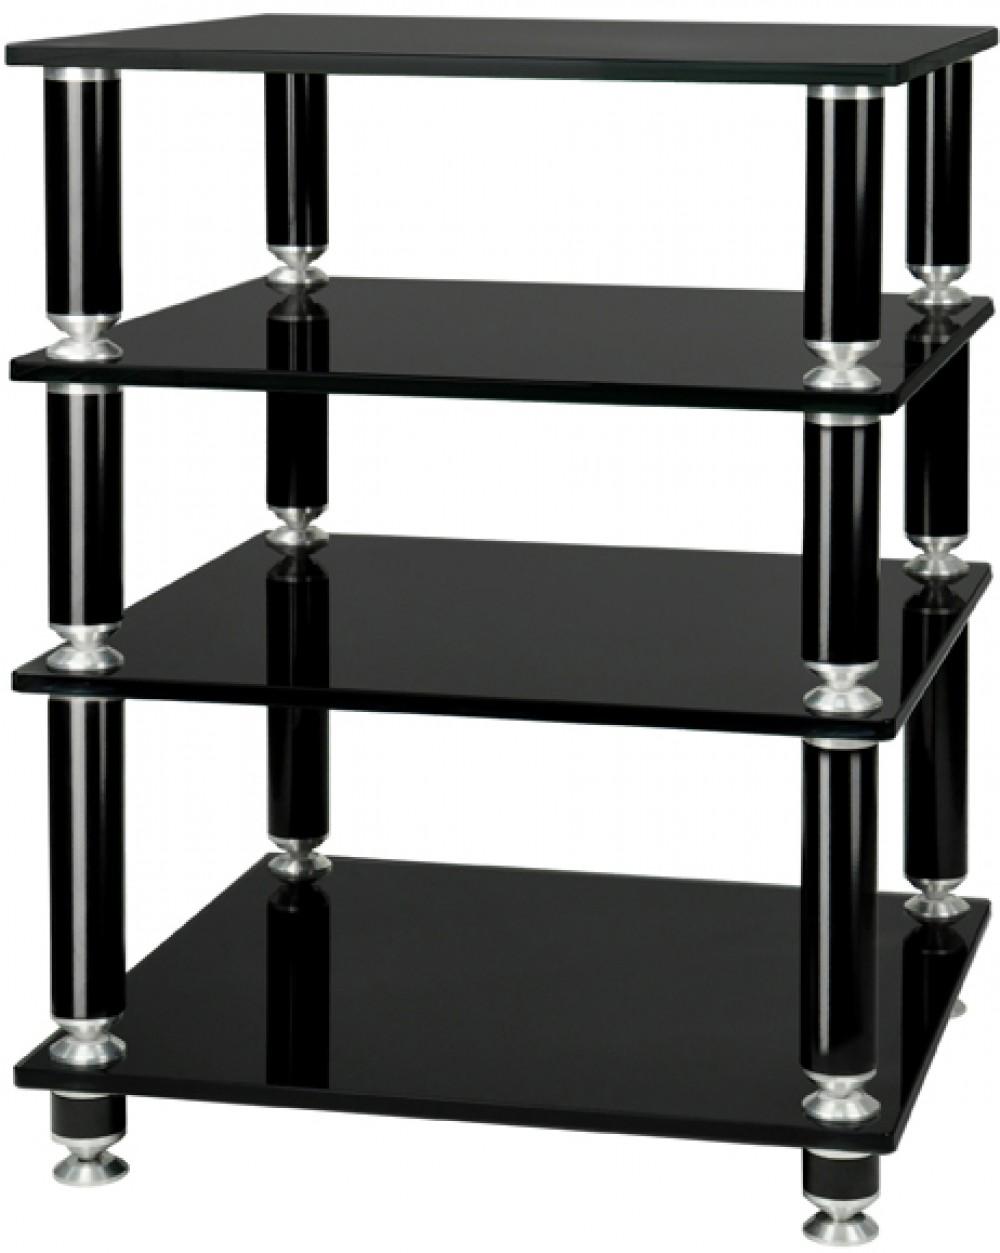 hifi rack reference audio. Black Bedroom Furniture Sets. Home Design Ideas